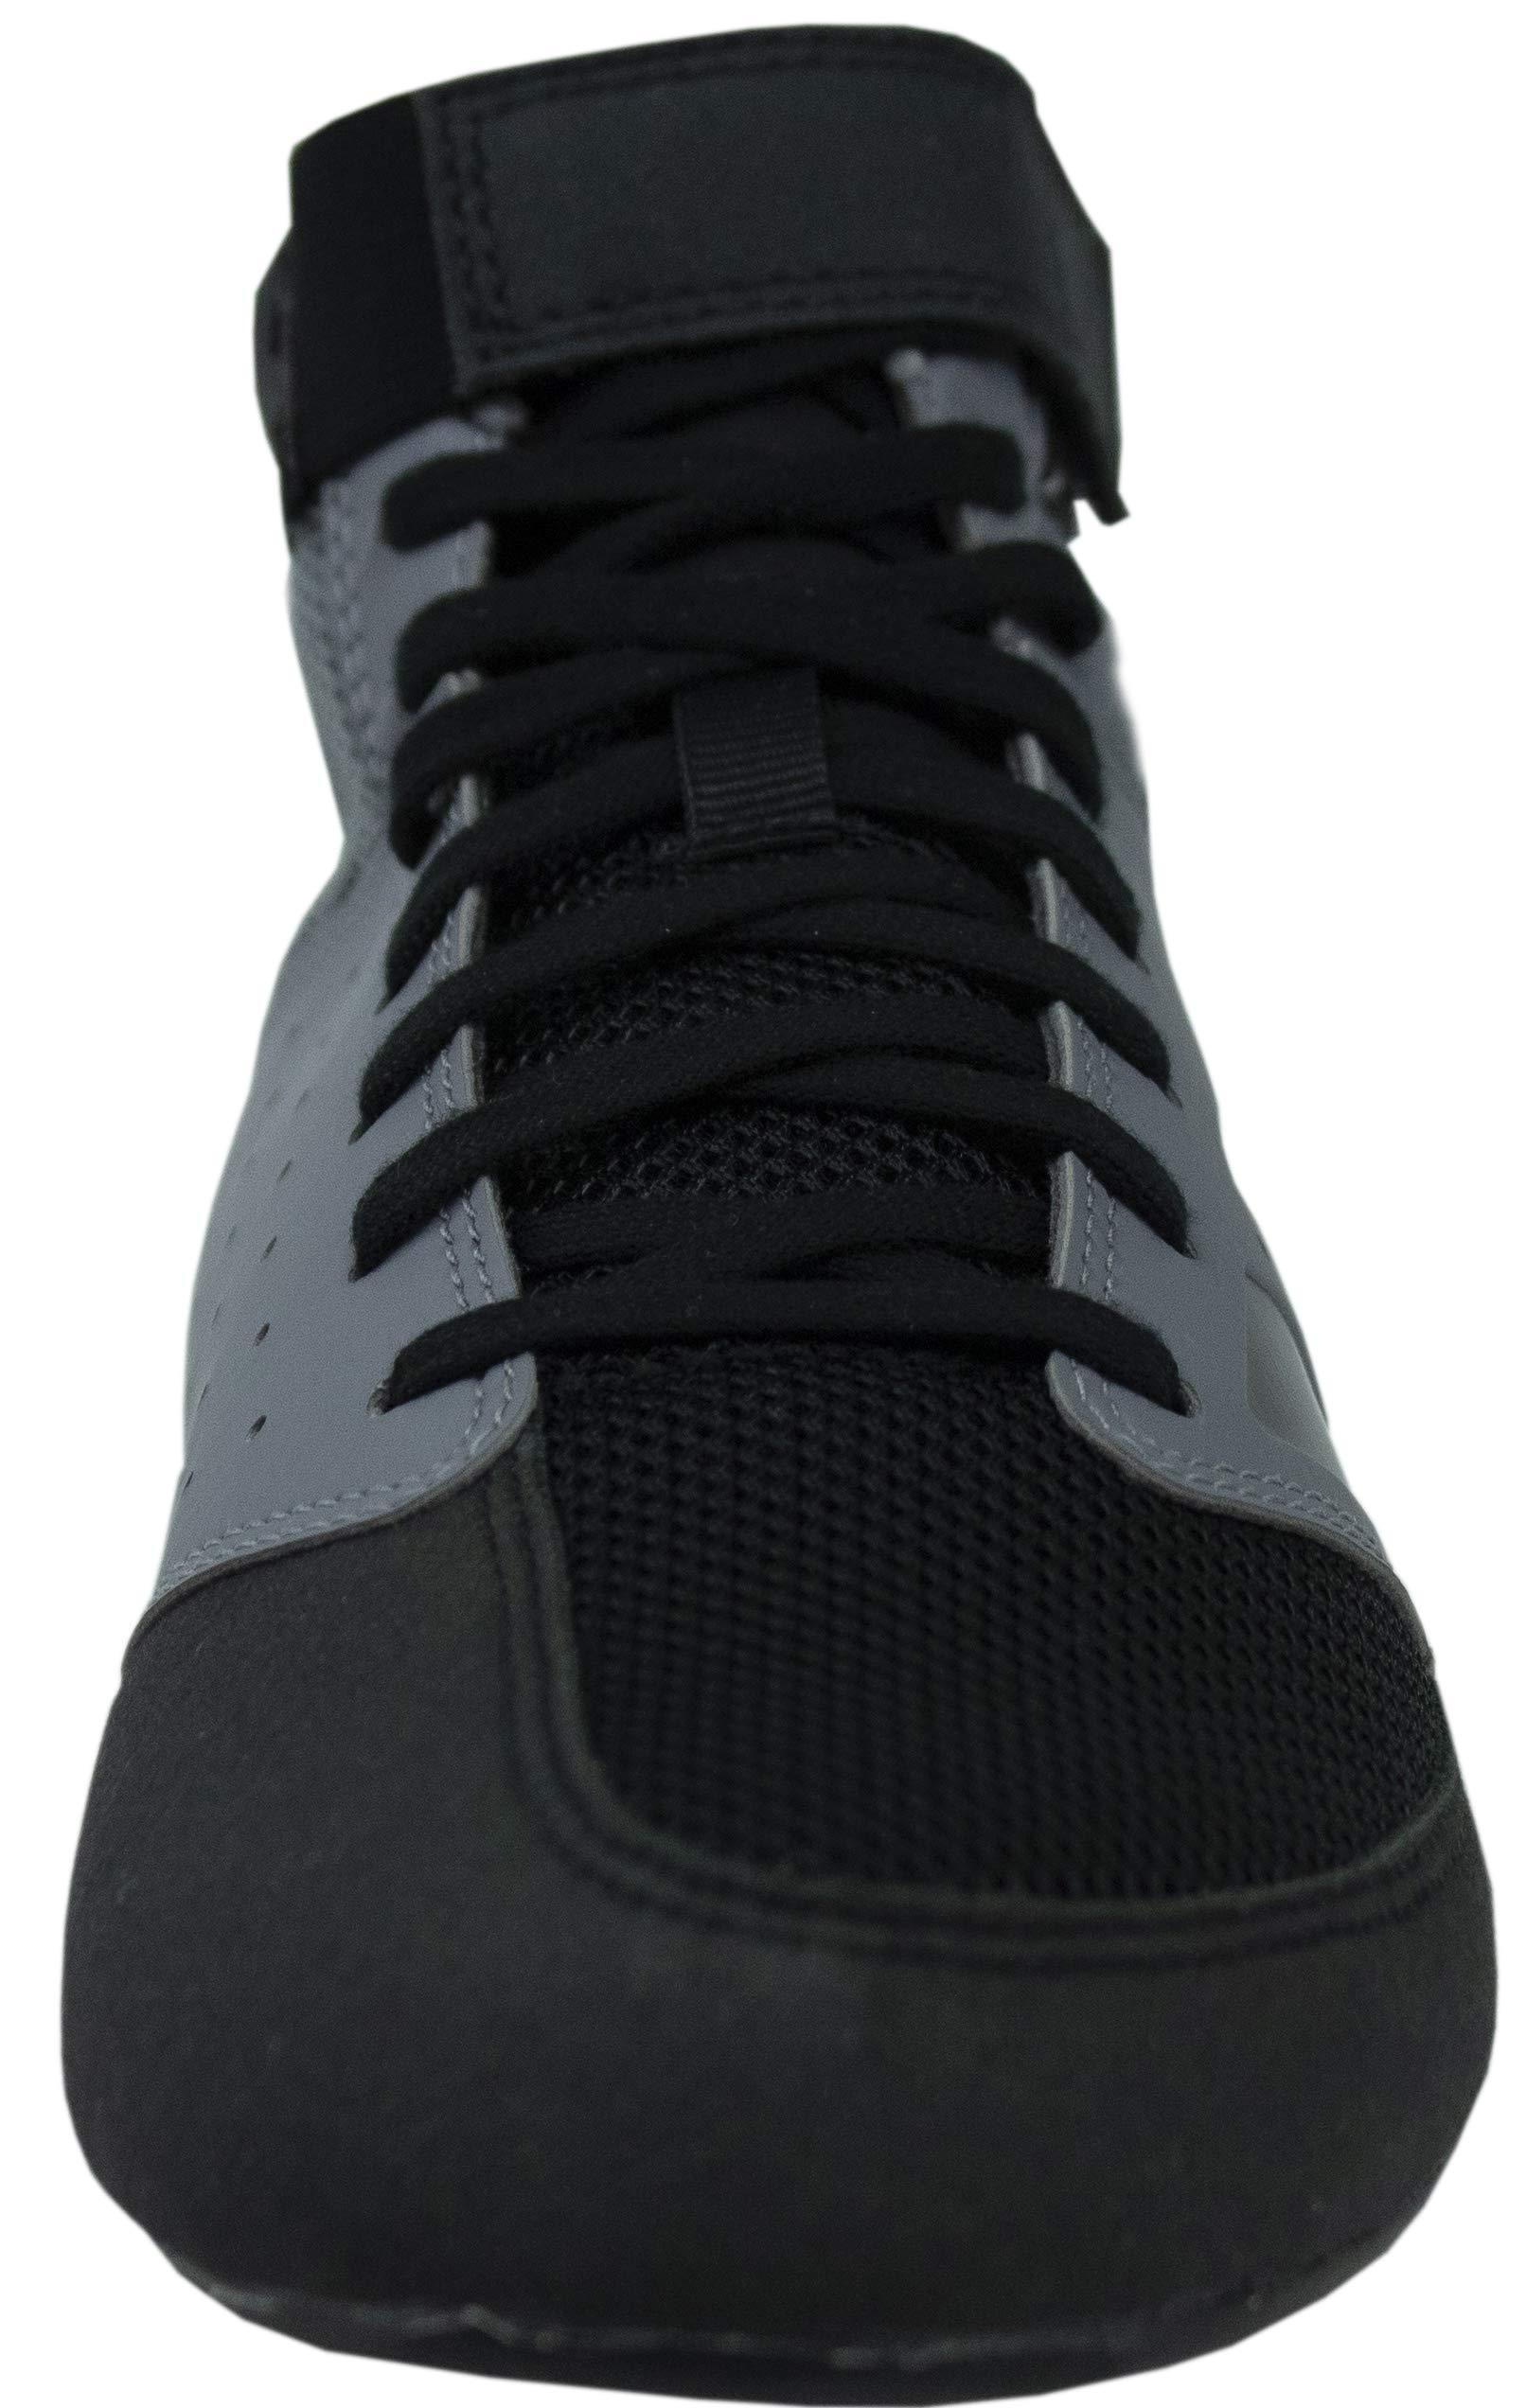 adidas Men's Mat Hog 2.0 Wrestling Shoes (15, Grey/Black) by adidas